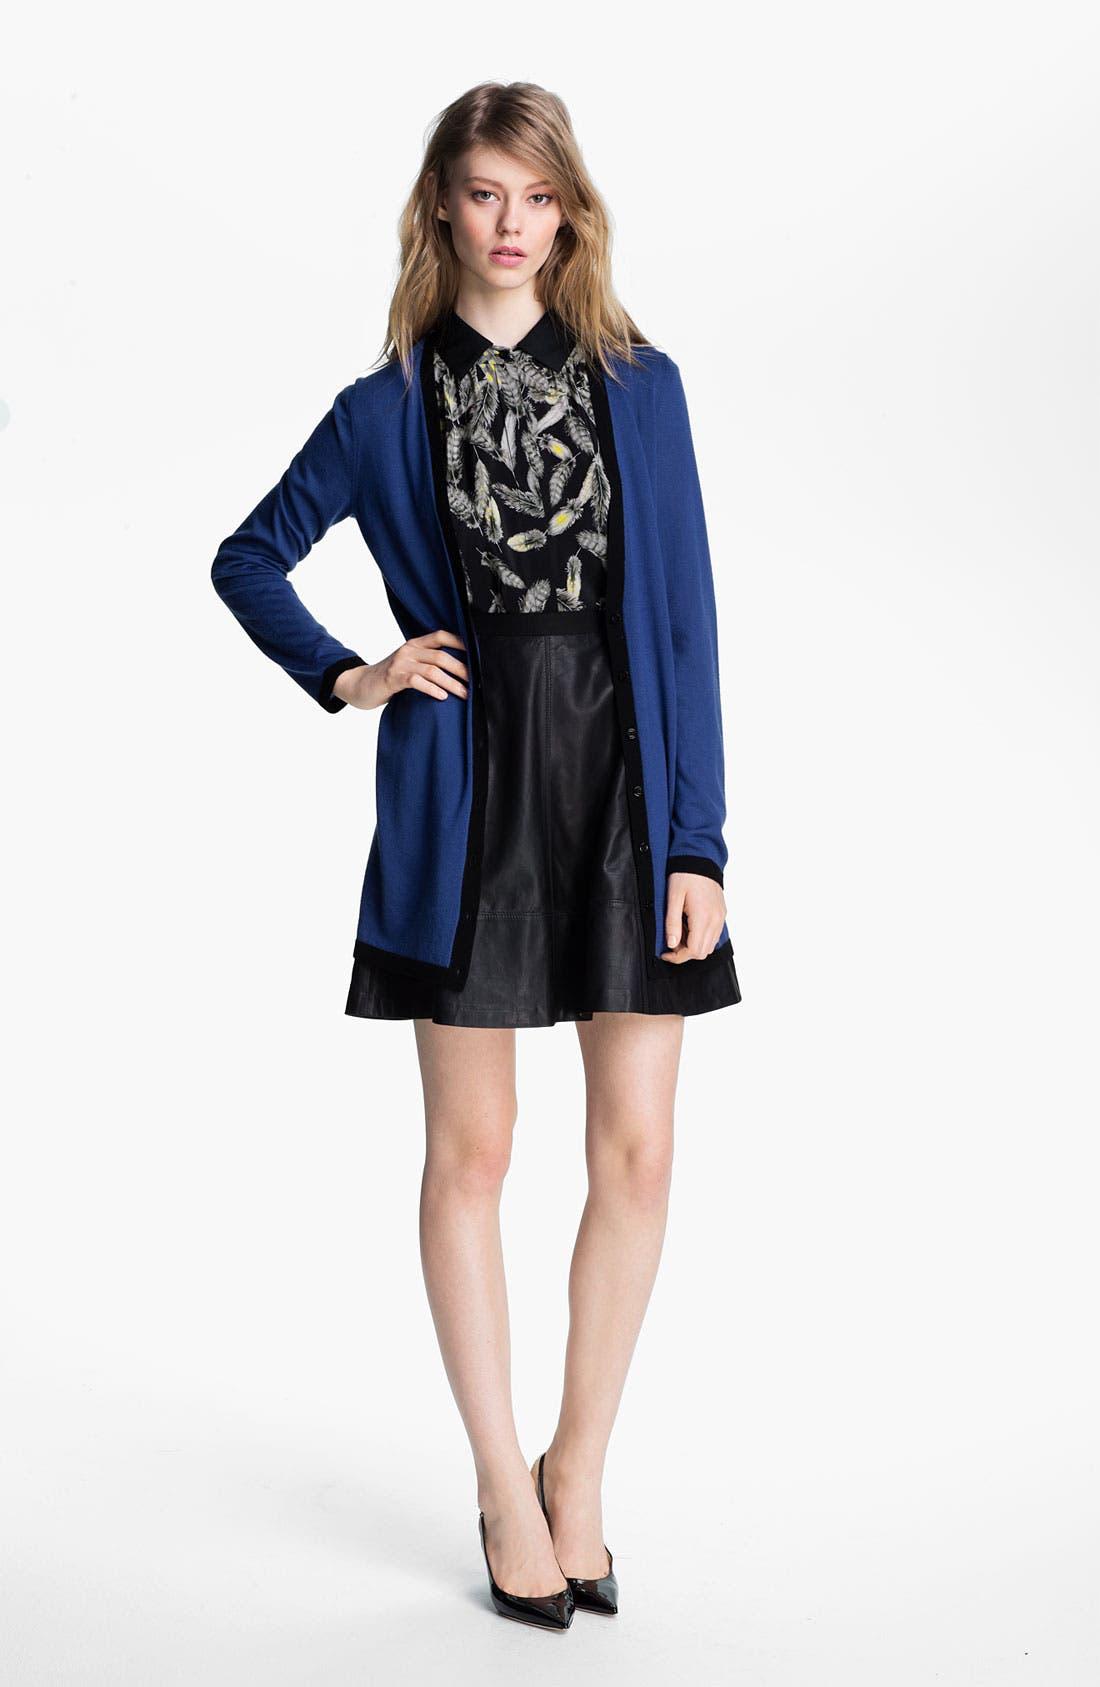 Main Image - Miss Wu Cardigan, Blouse & Skirt